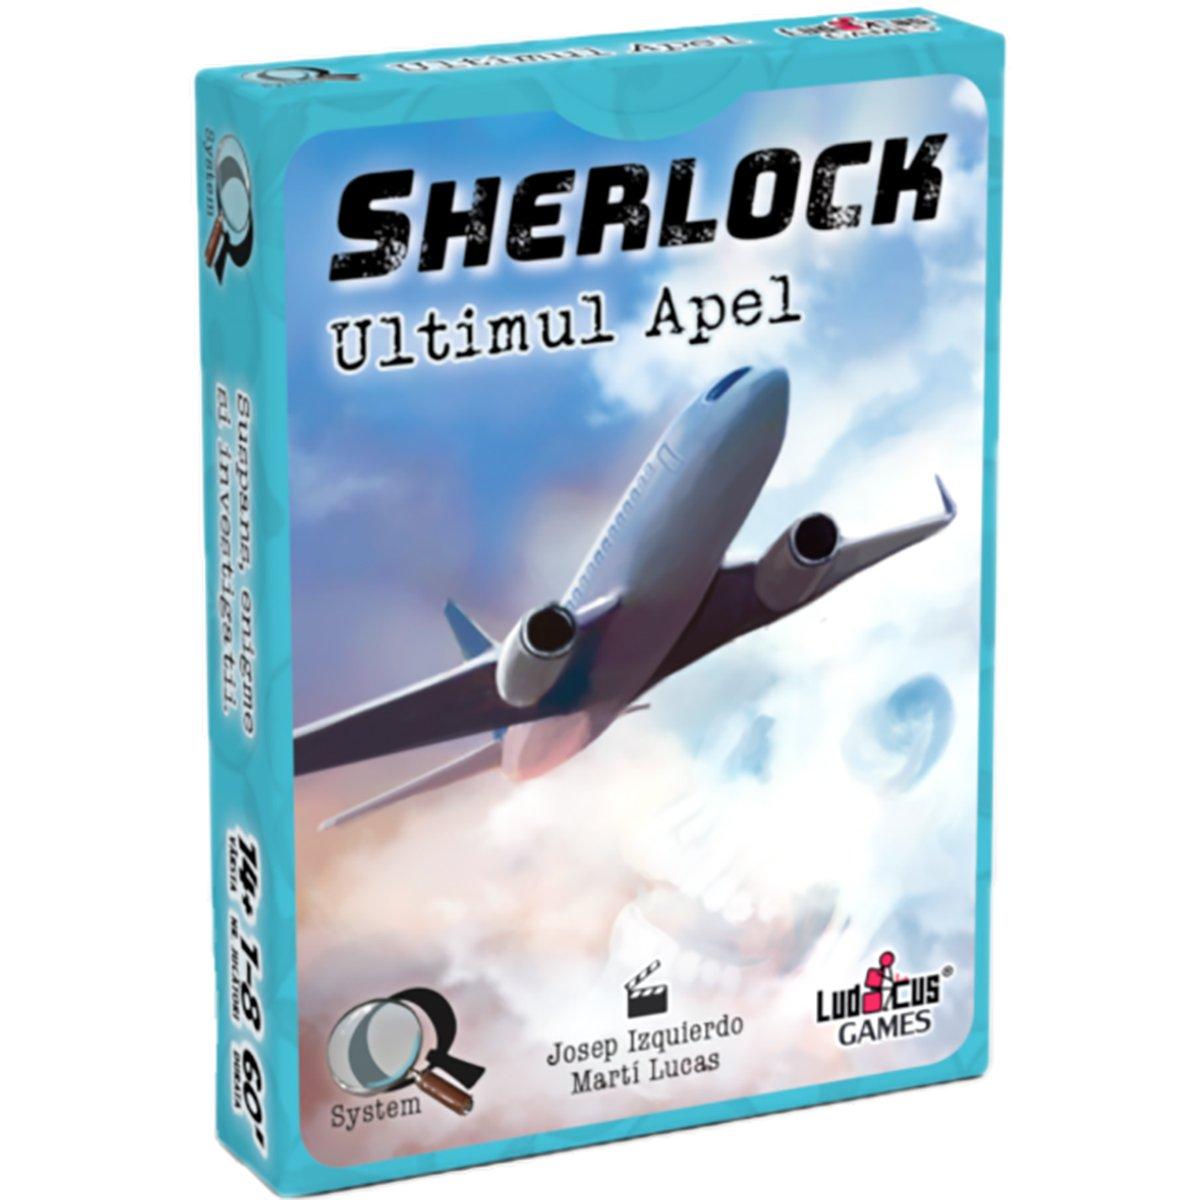 Joc de societate Enigma Studio, Sherlock, Q1 Ultimul apel imagine